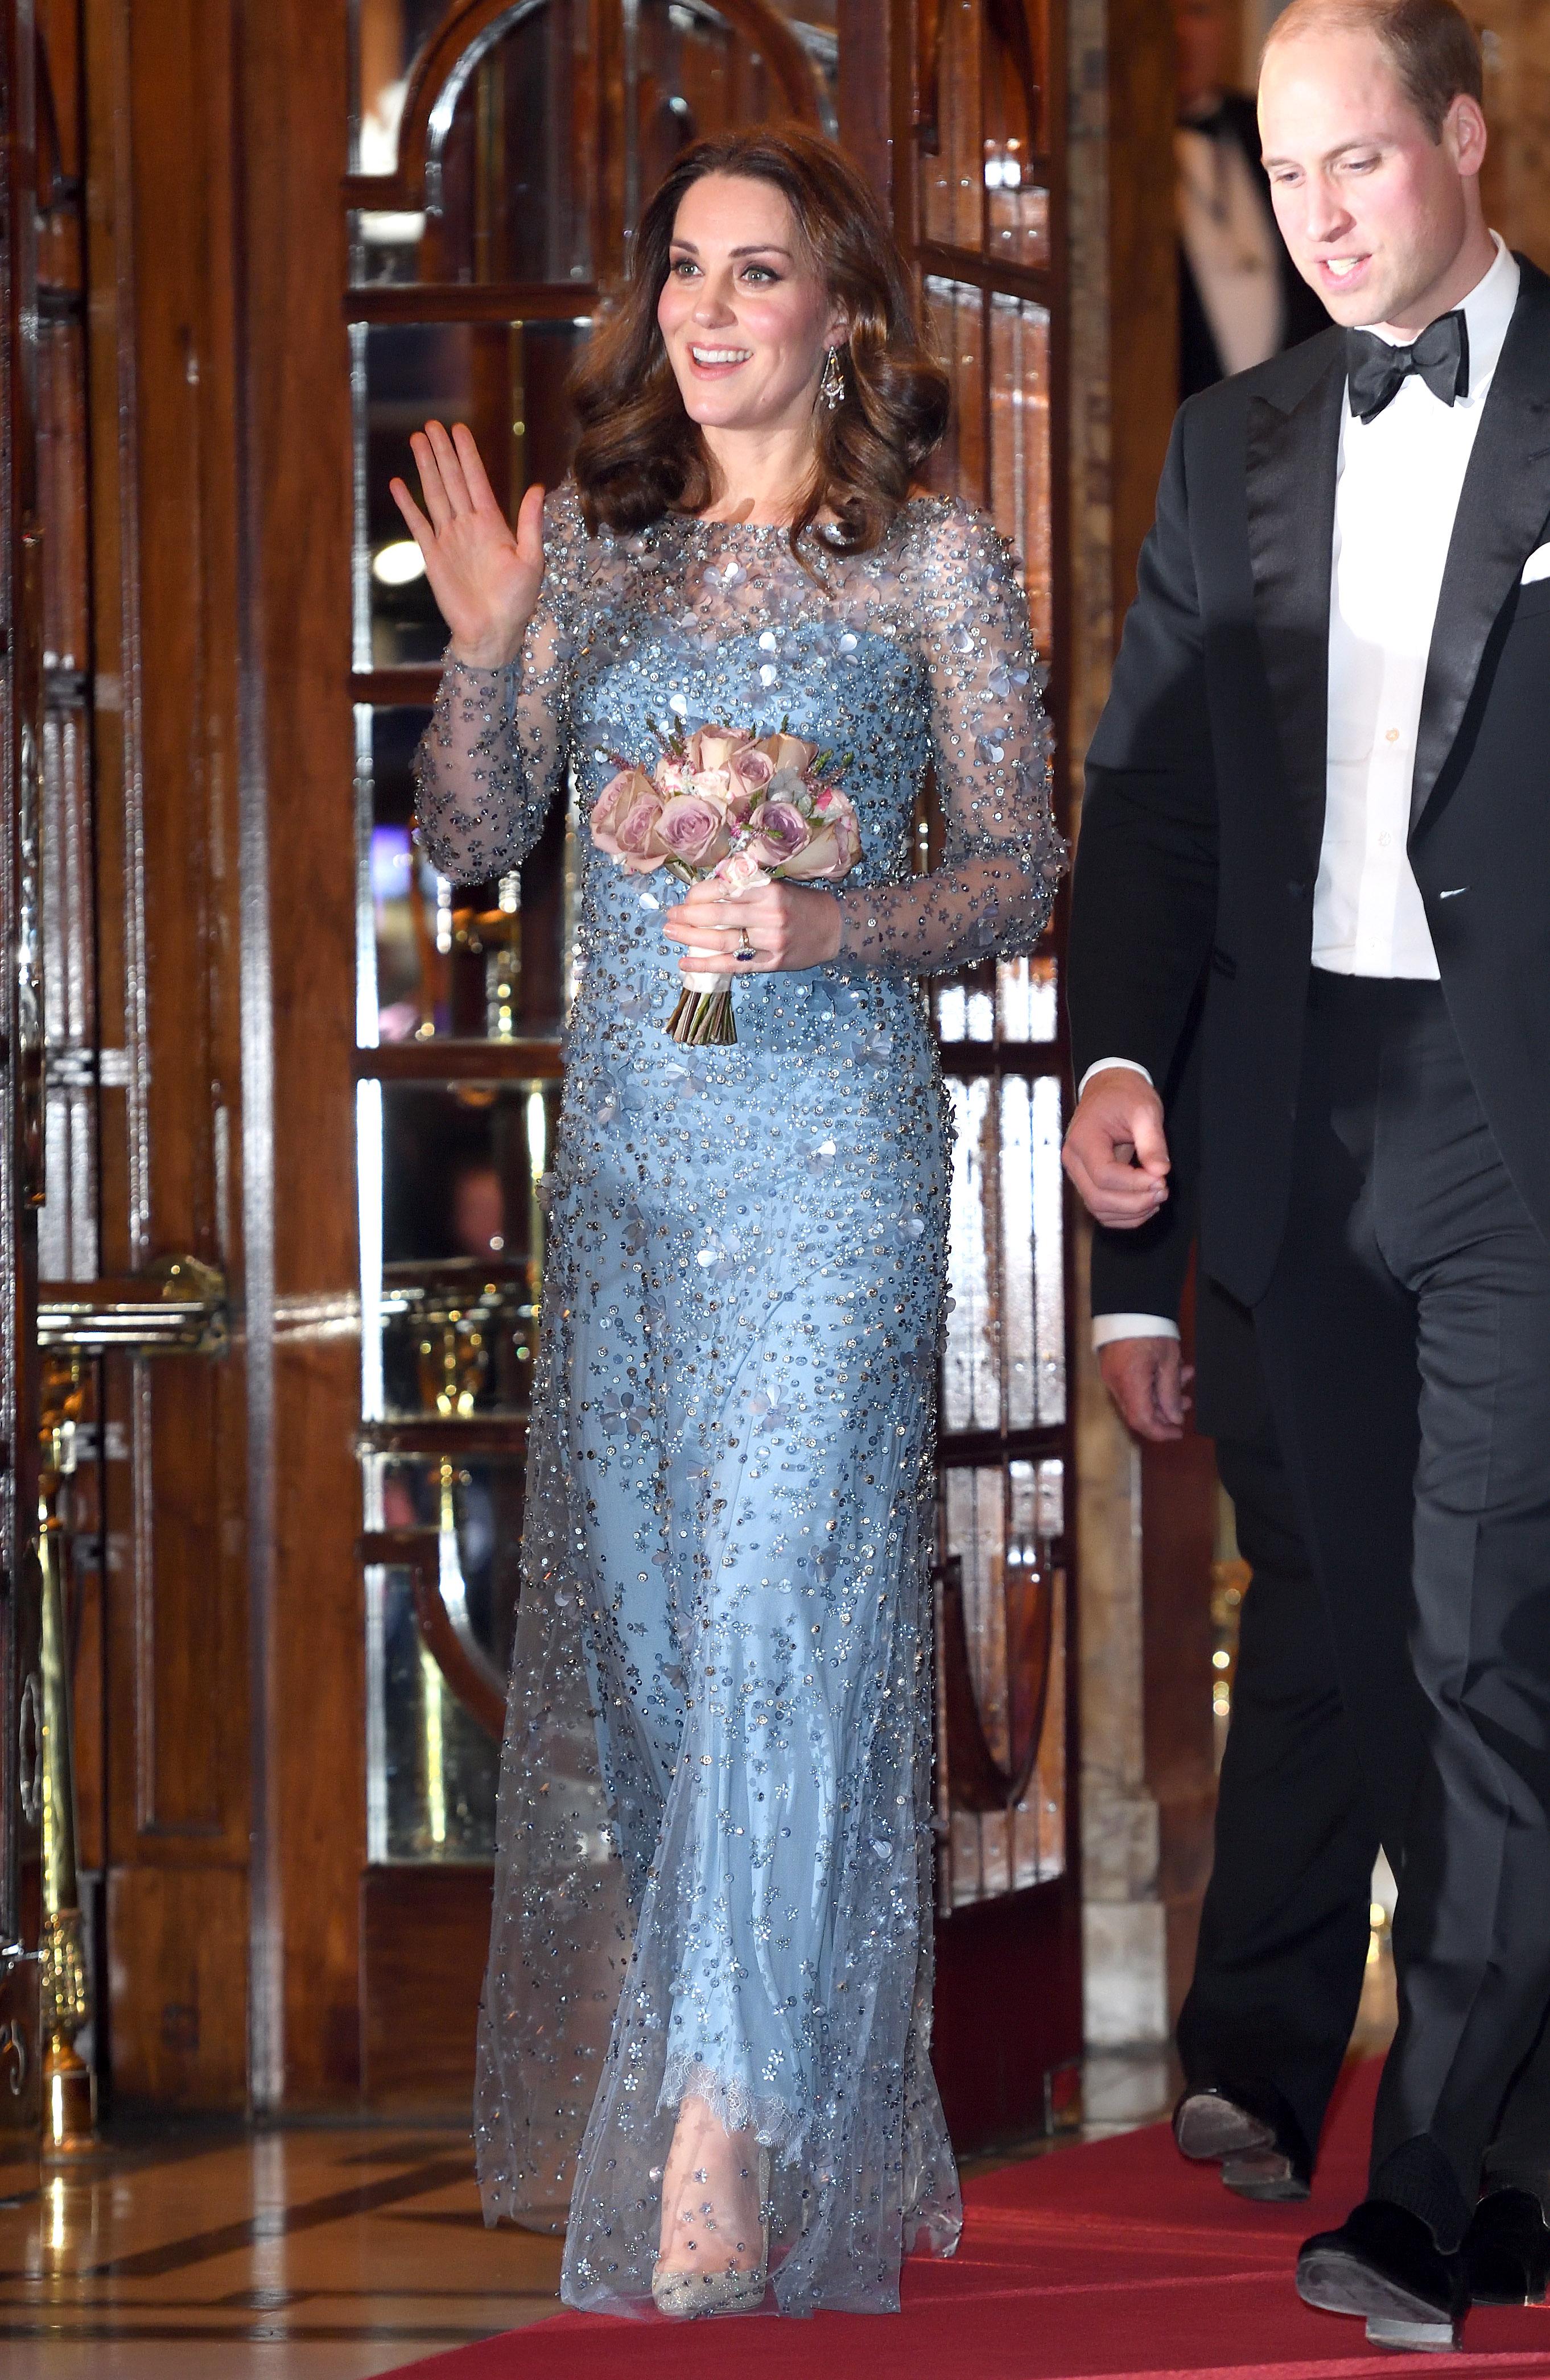 Kate Middleton com o vestido da Elsa de Frozen